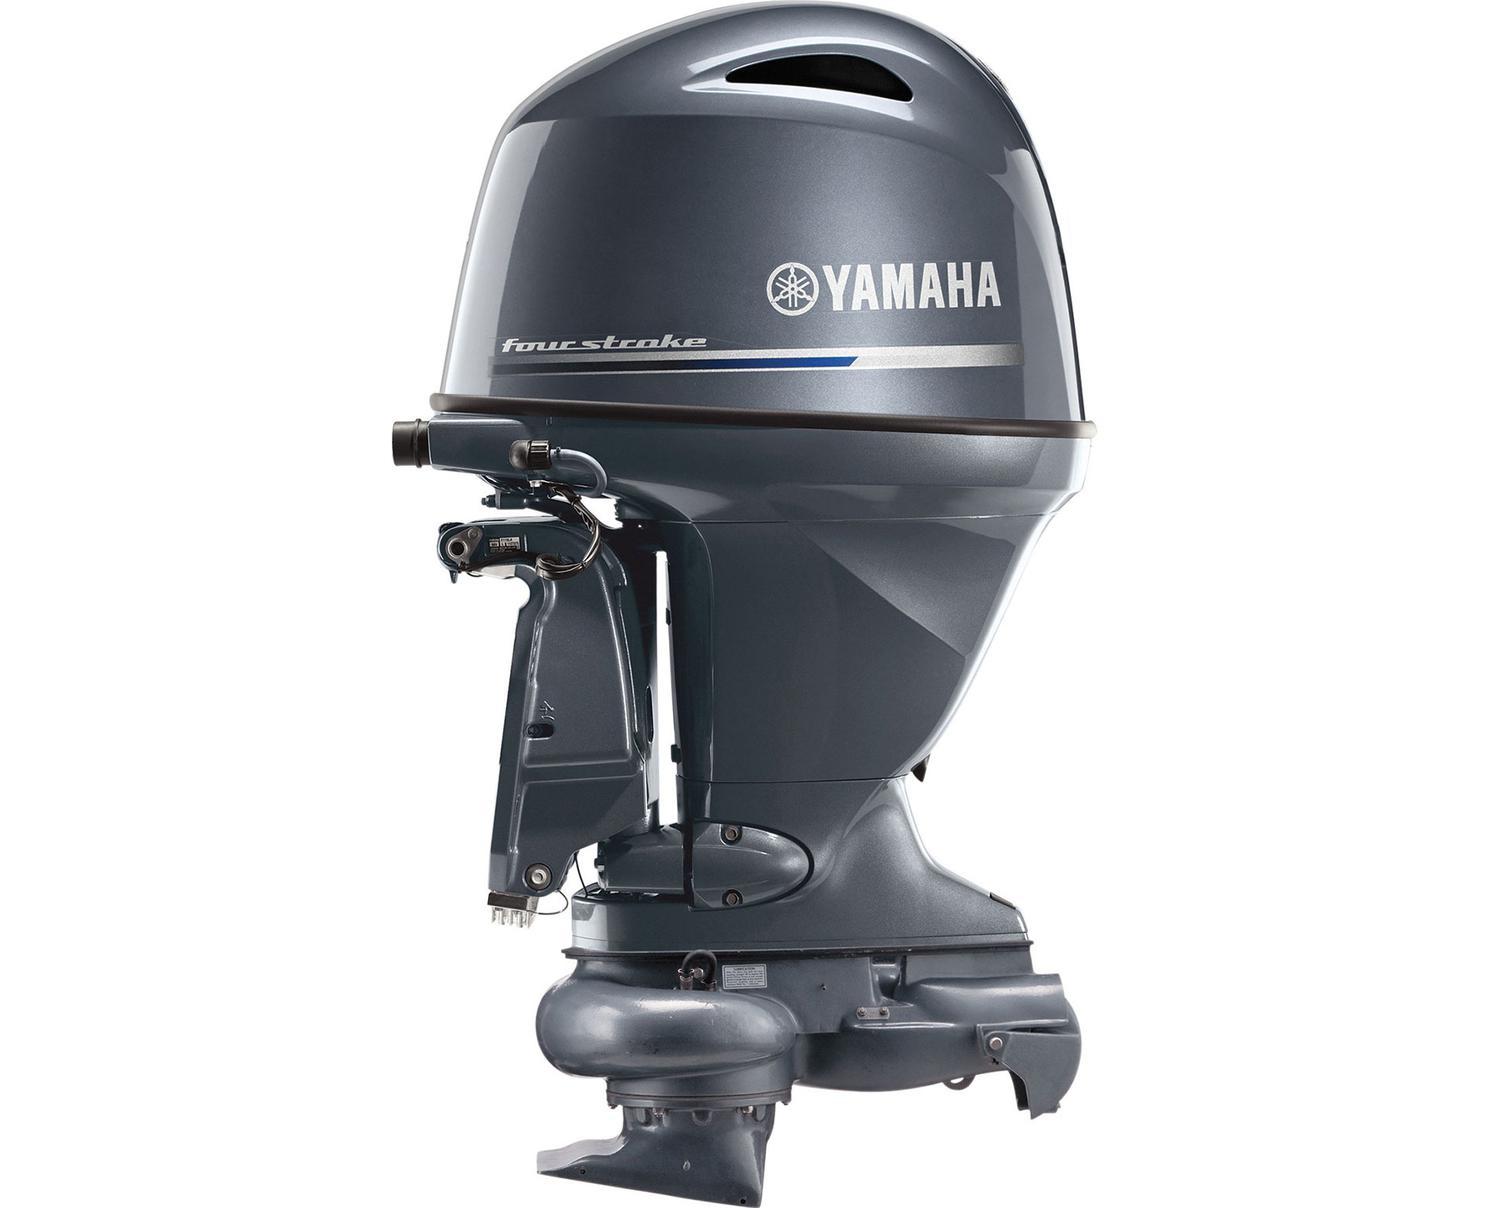 2021 Yamaha F115 Jet Drive Bluish Gray Metallic